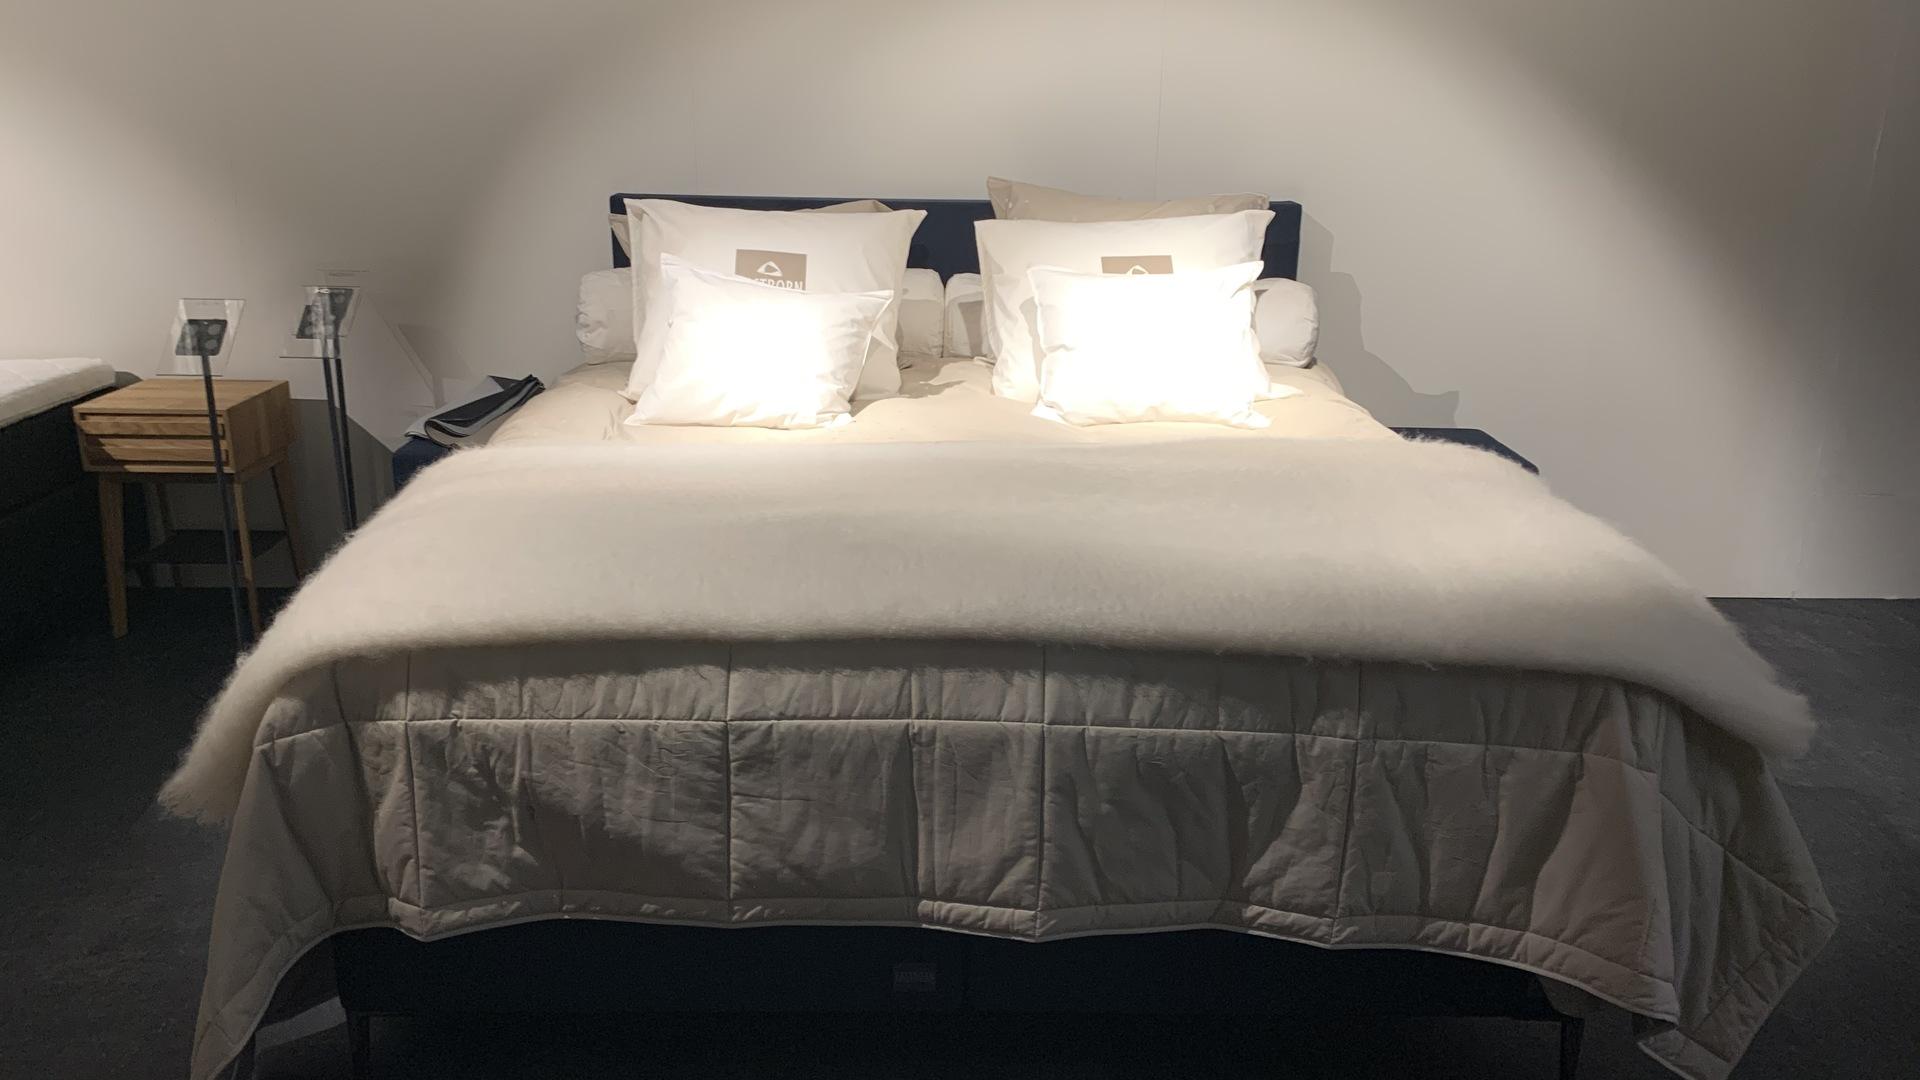 IMG-3206 (002).jpg eastborn bed.jpg